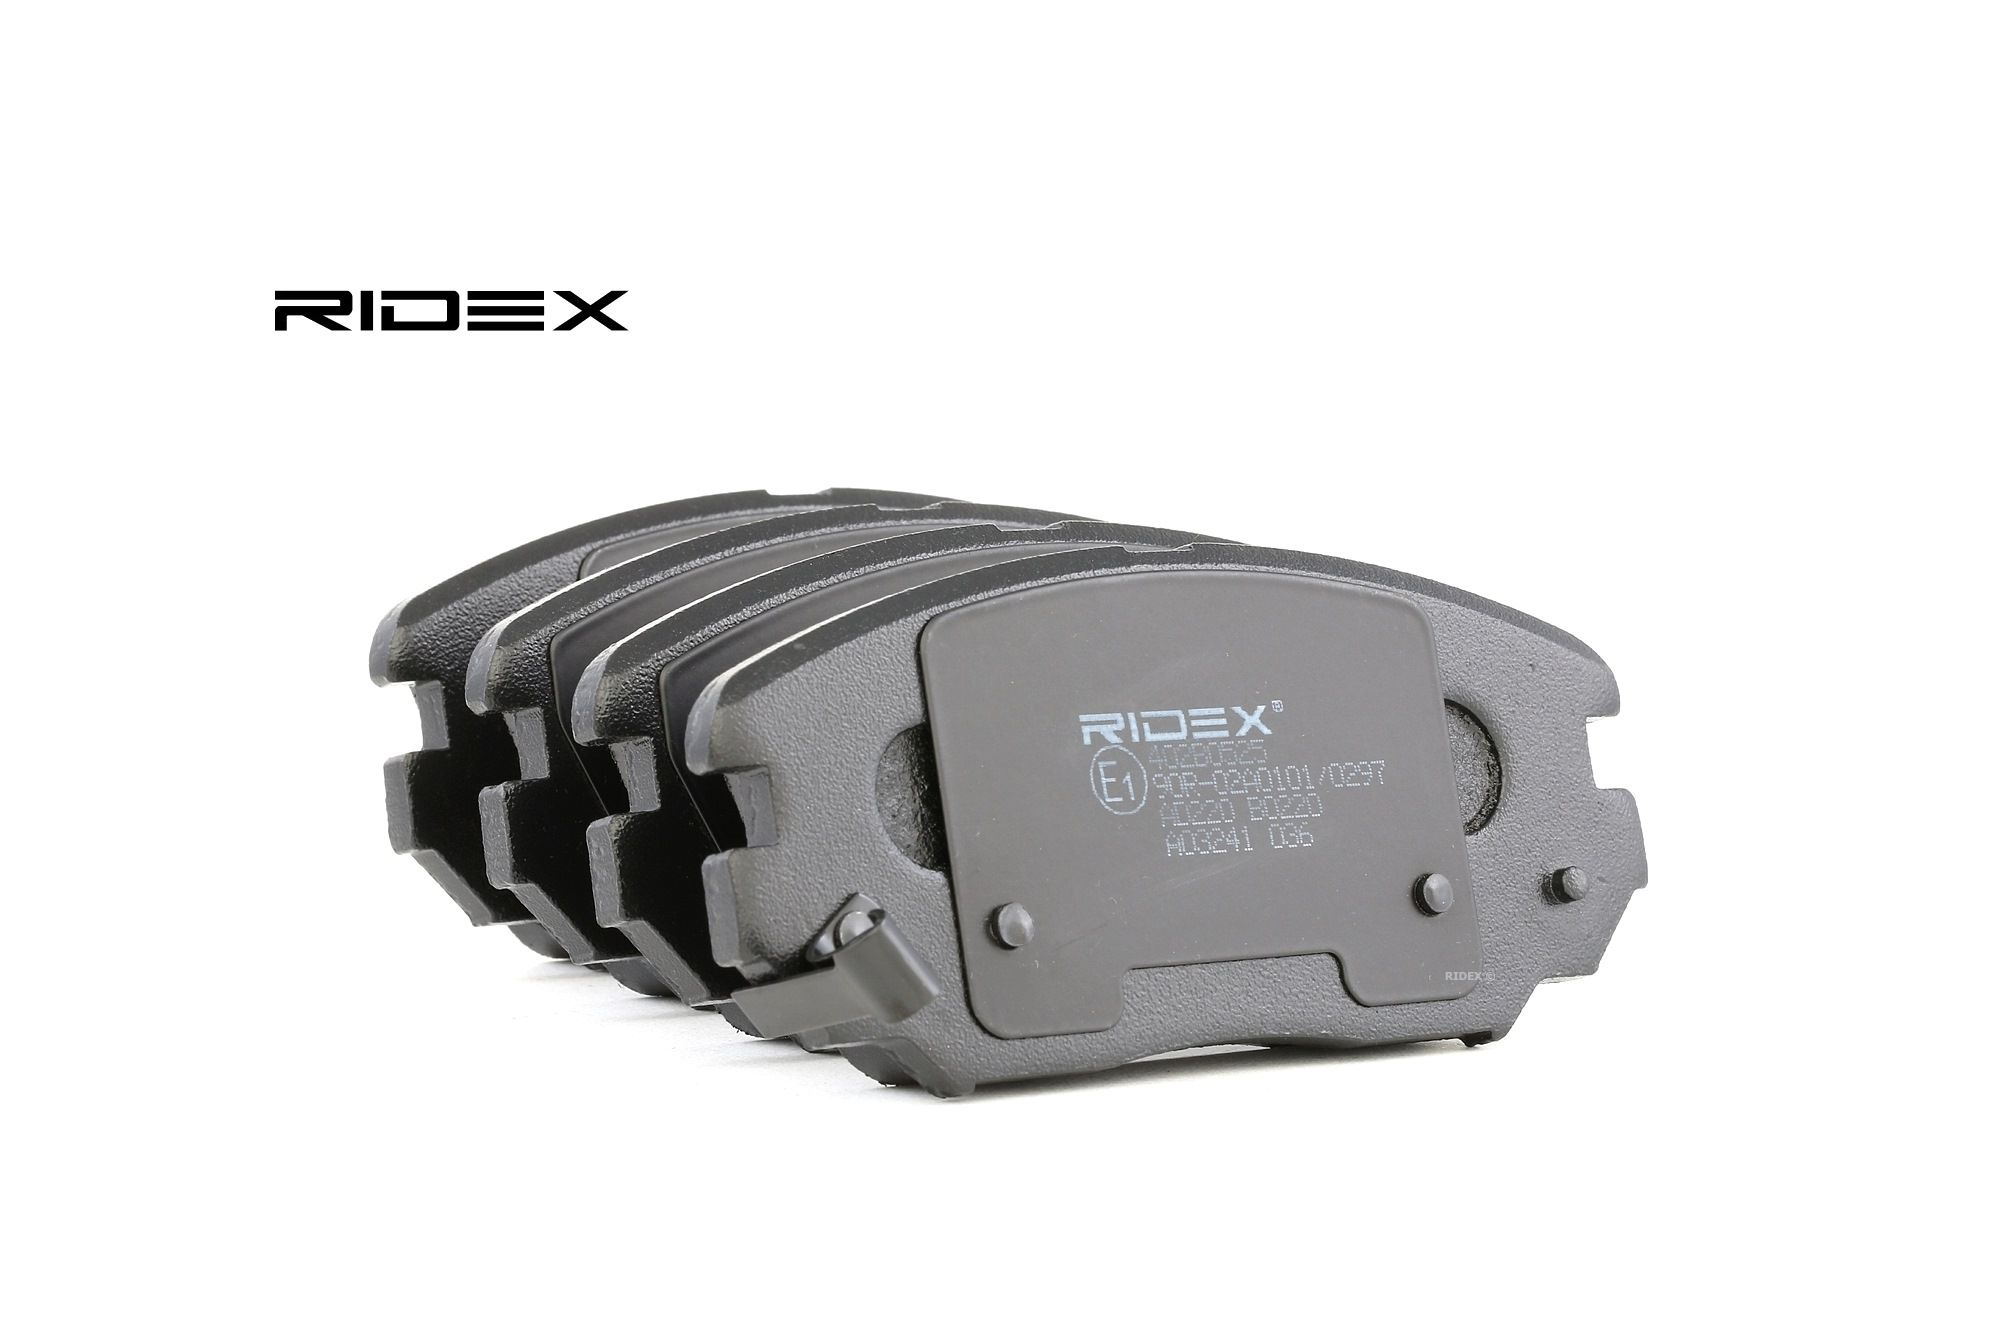 KIA OPIRUS 2020 Bremsbelagsatz - Original RIDEX 402B0525 Höhe: 60,1mm, Dicke/Stärke: 17,5mm